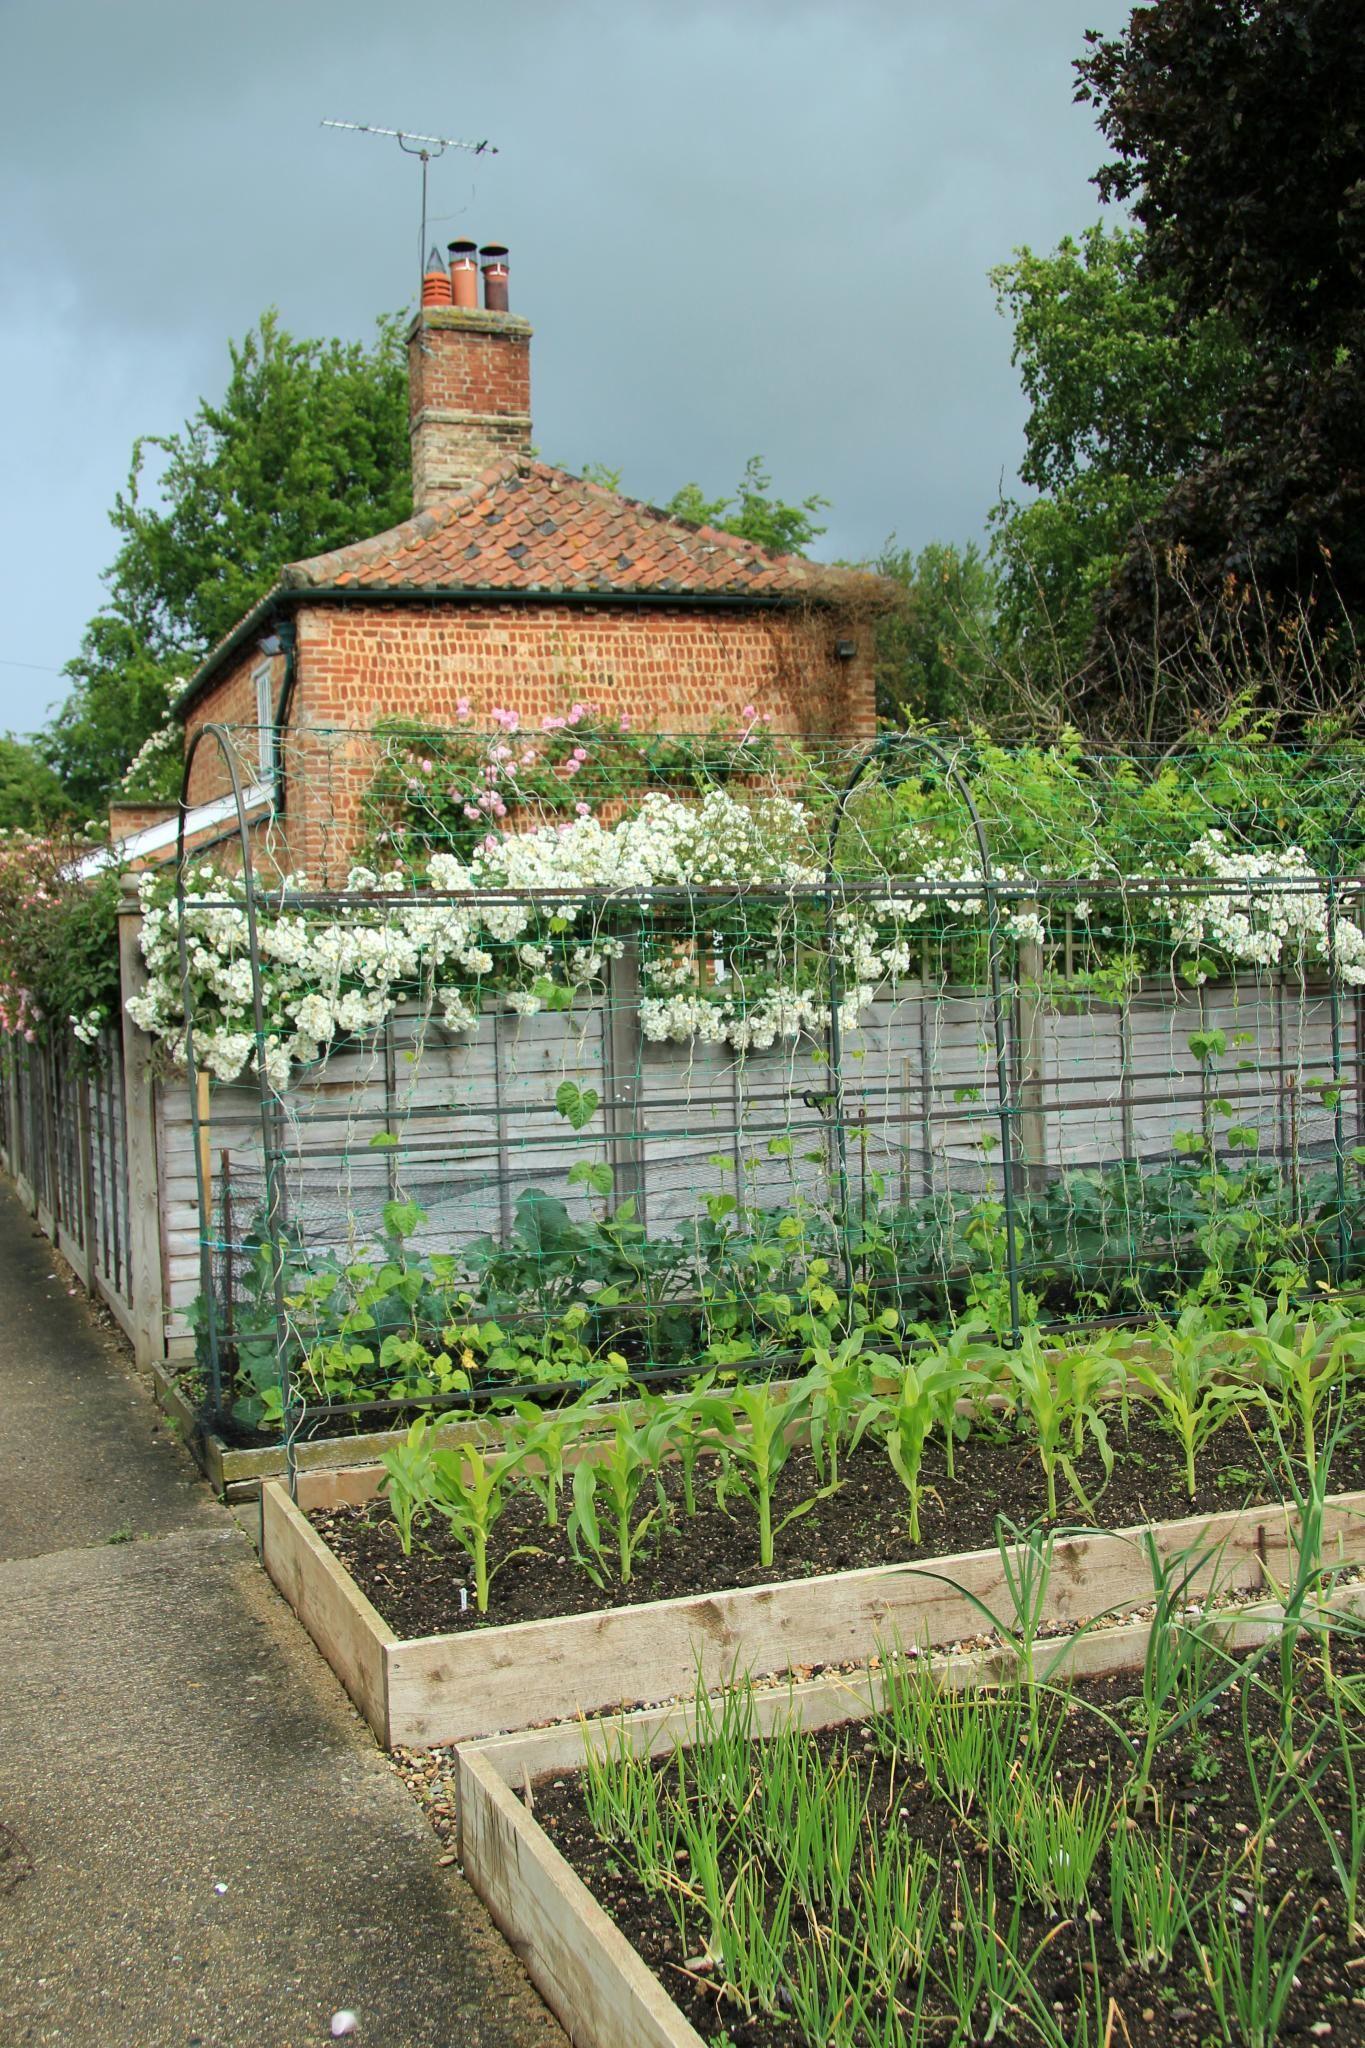 chippenham park gardens 24 06 2012 garden potager. Black Bedroom Furniture Sets. Home Design Ideas